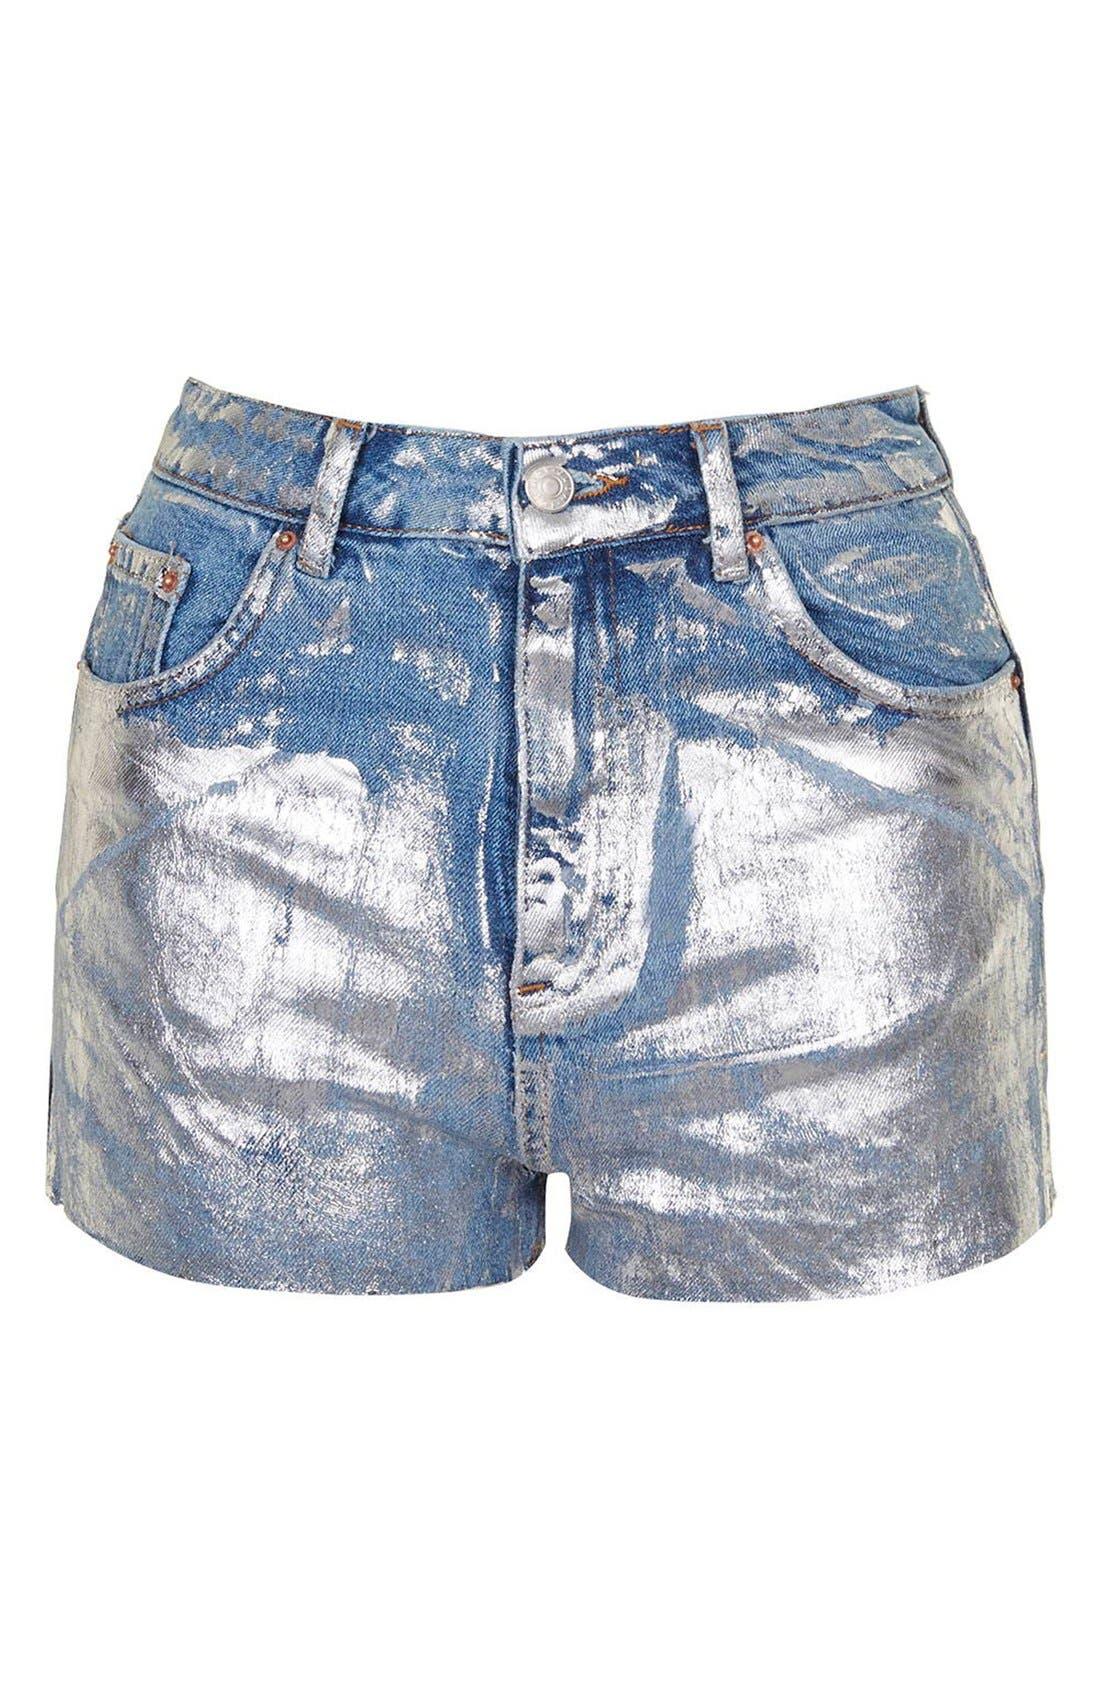 Alternate Image 4  - Topshop Moto Metallic Paint Cutoff Mom Shorts